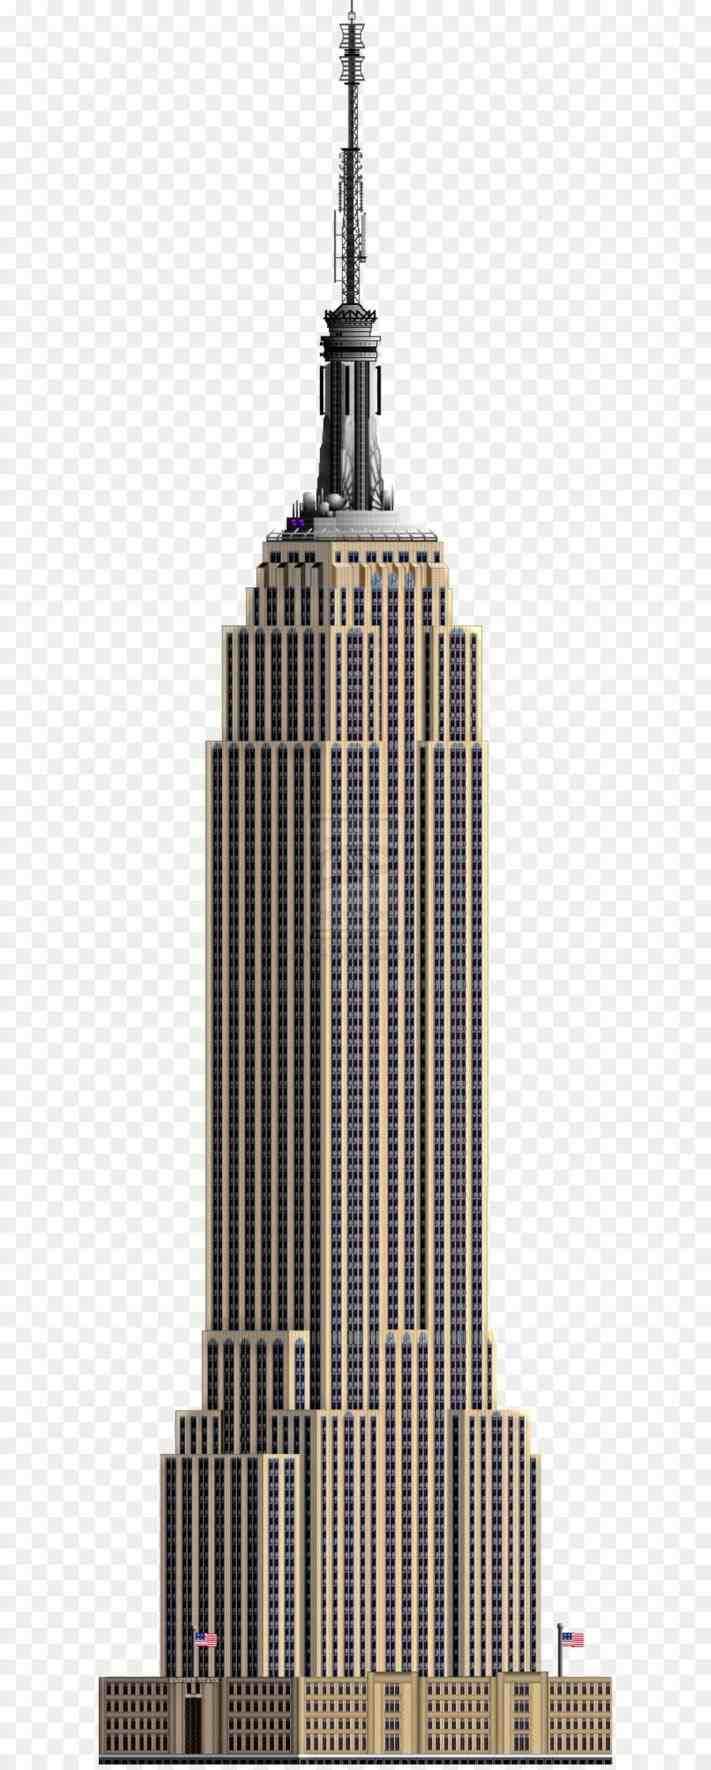 Buildings clipart skyscraper. Rhkisspngcom chrysler empire state